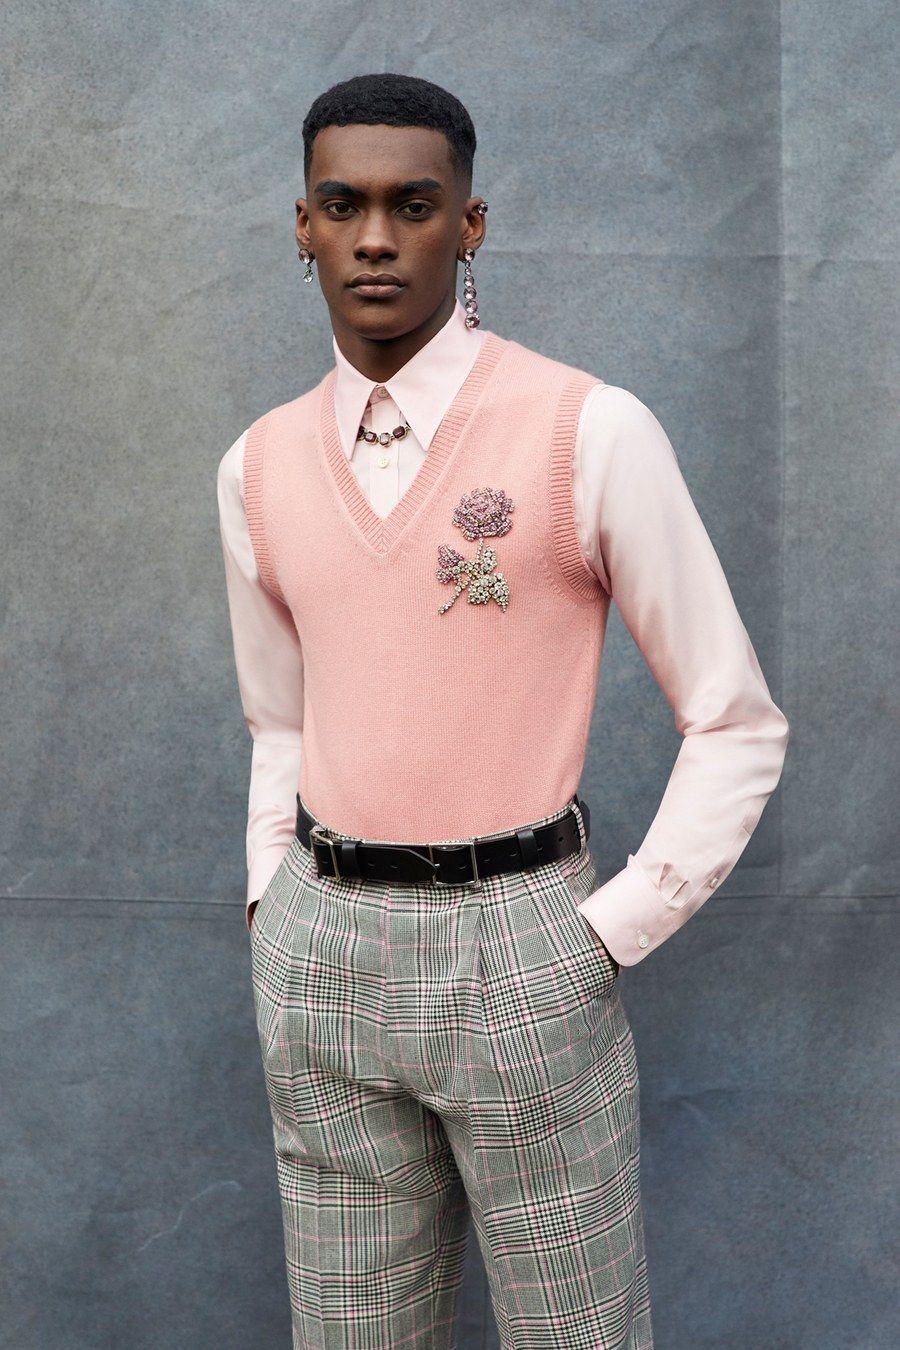 Alexander McQueen Fall 2019 Menswear Fashion Show – boys